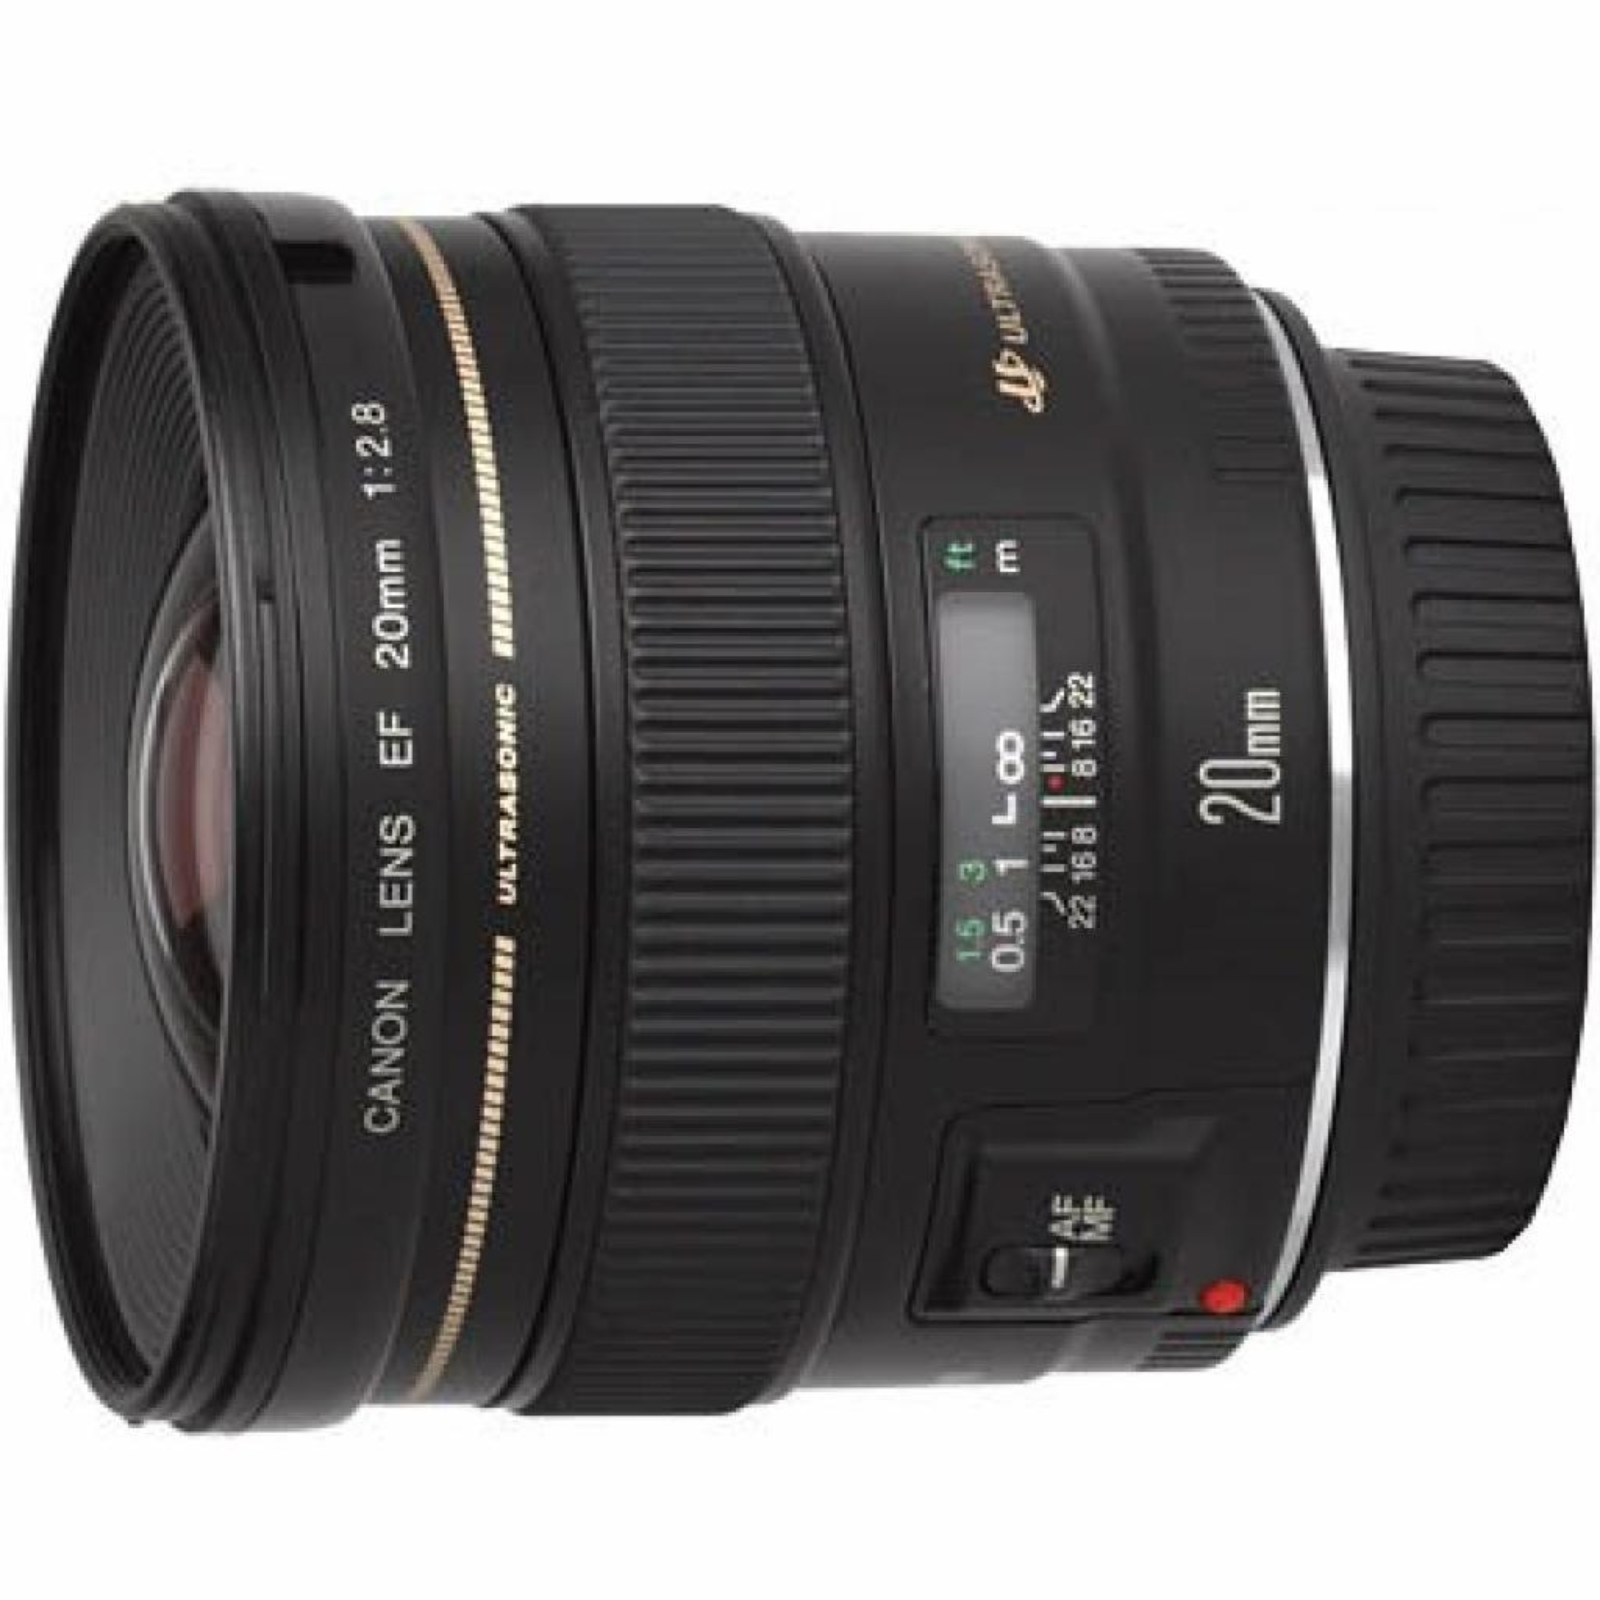 Объектив Canon EF 20mm f/2.8 USM (2509A010)